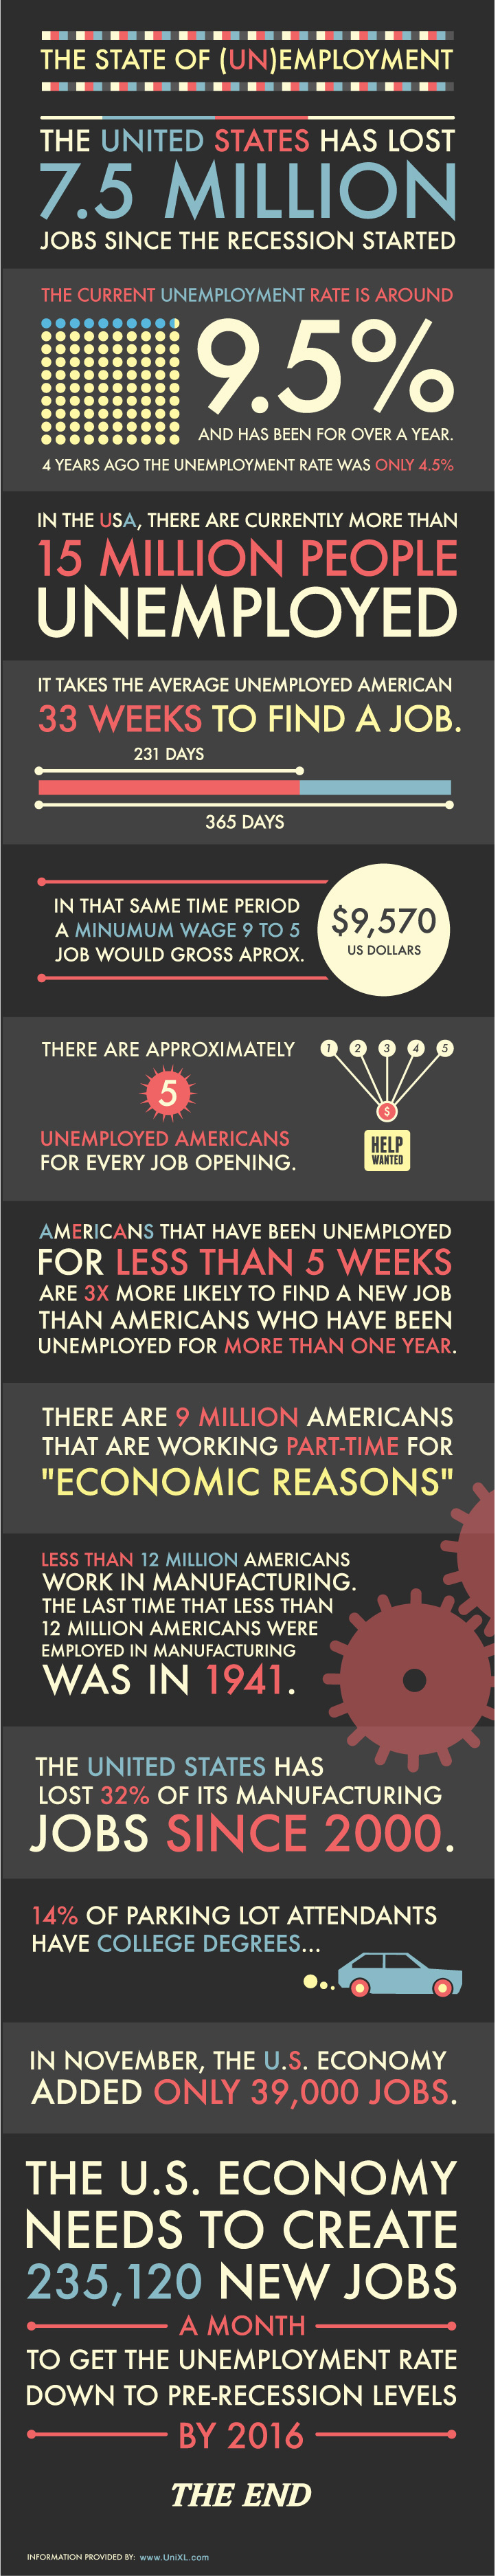 Unemployment Infographic